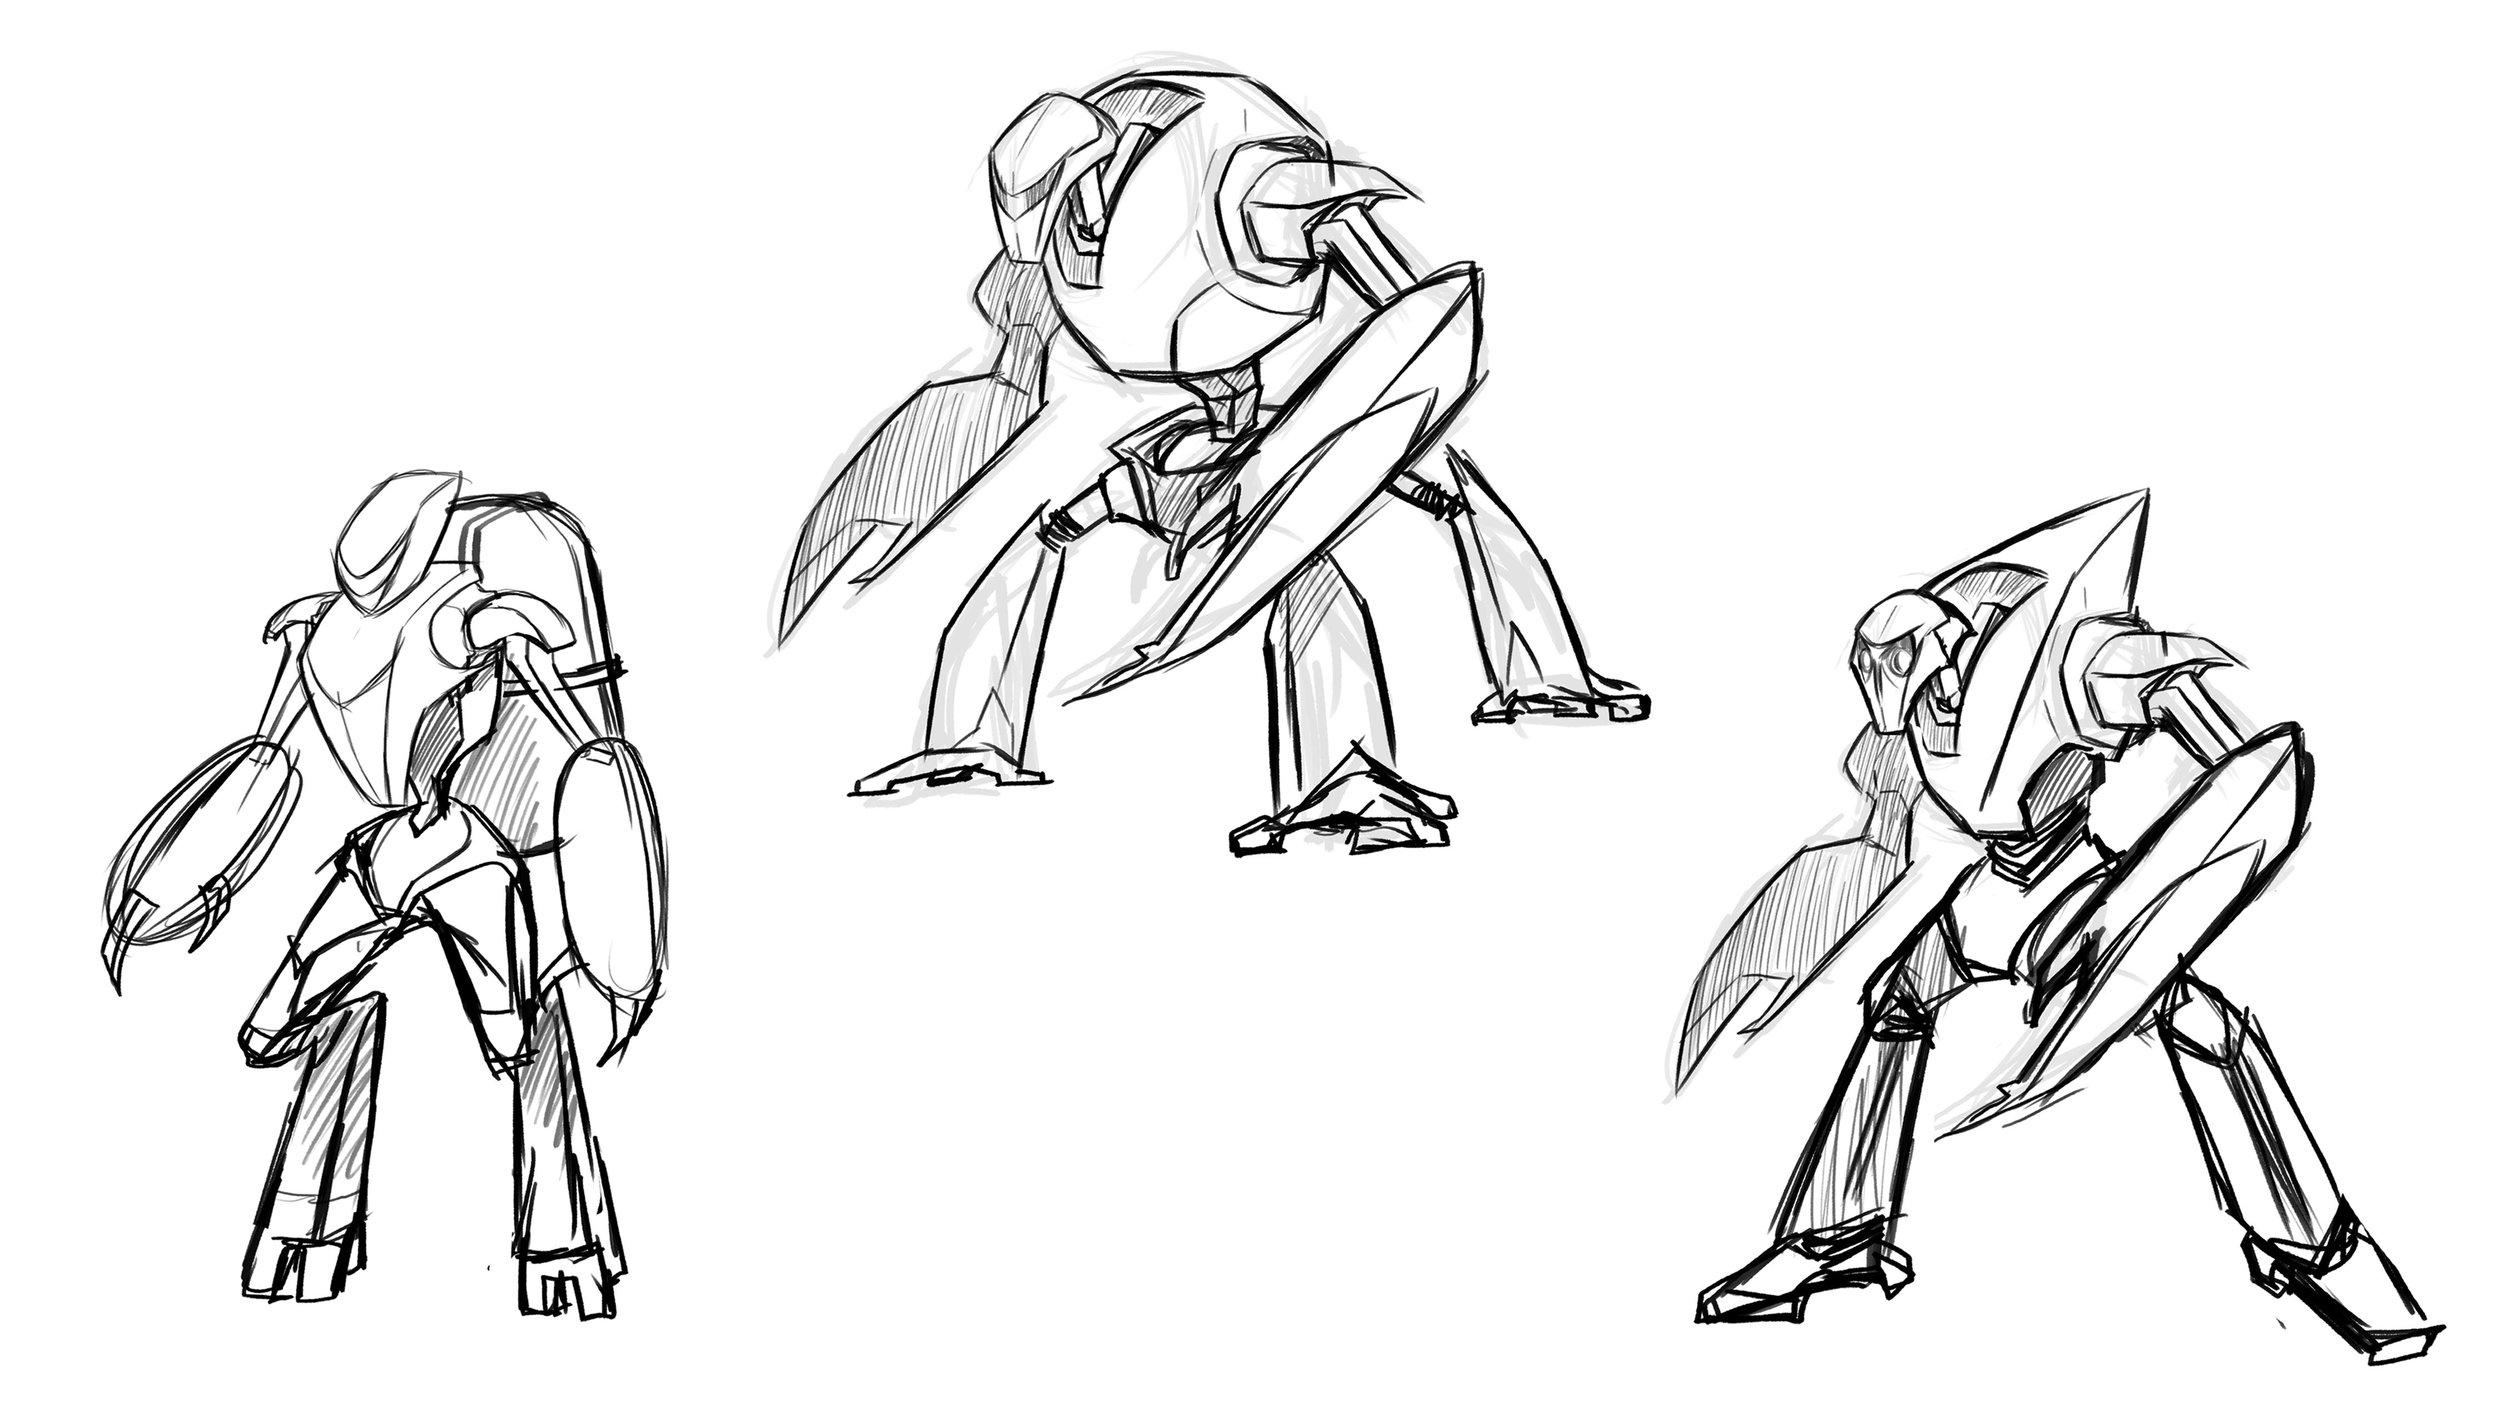 Swords concepts02.jpg